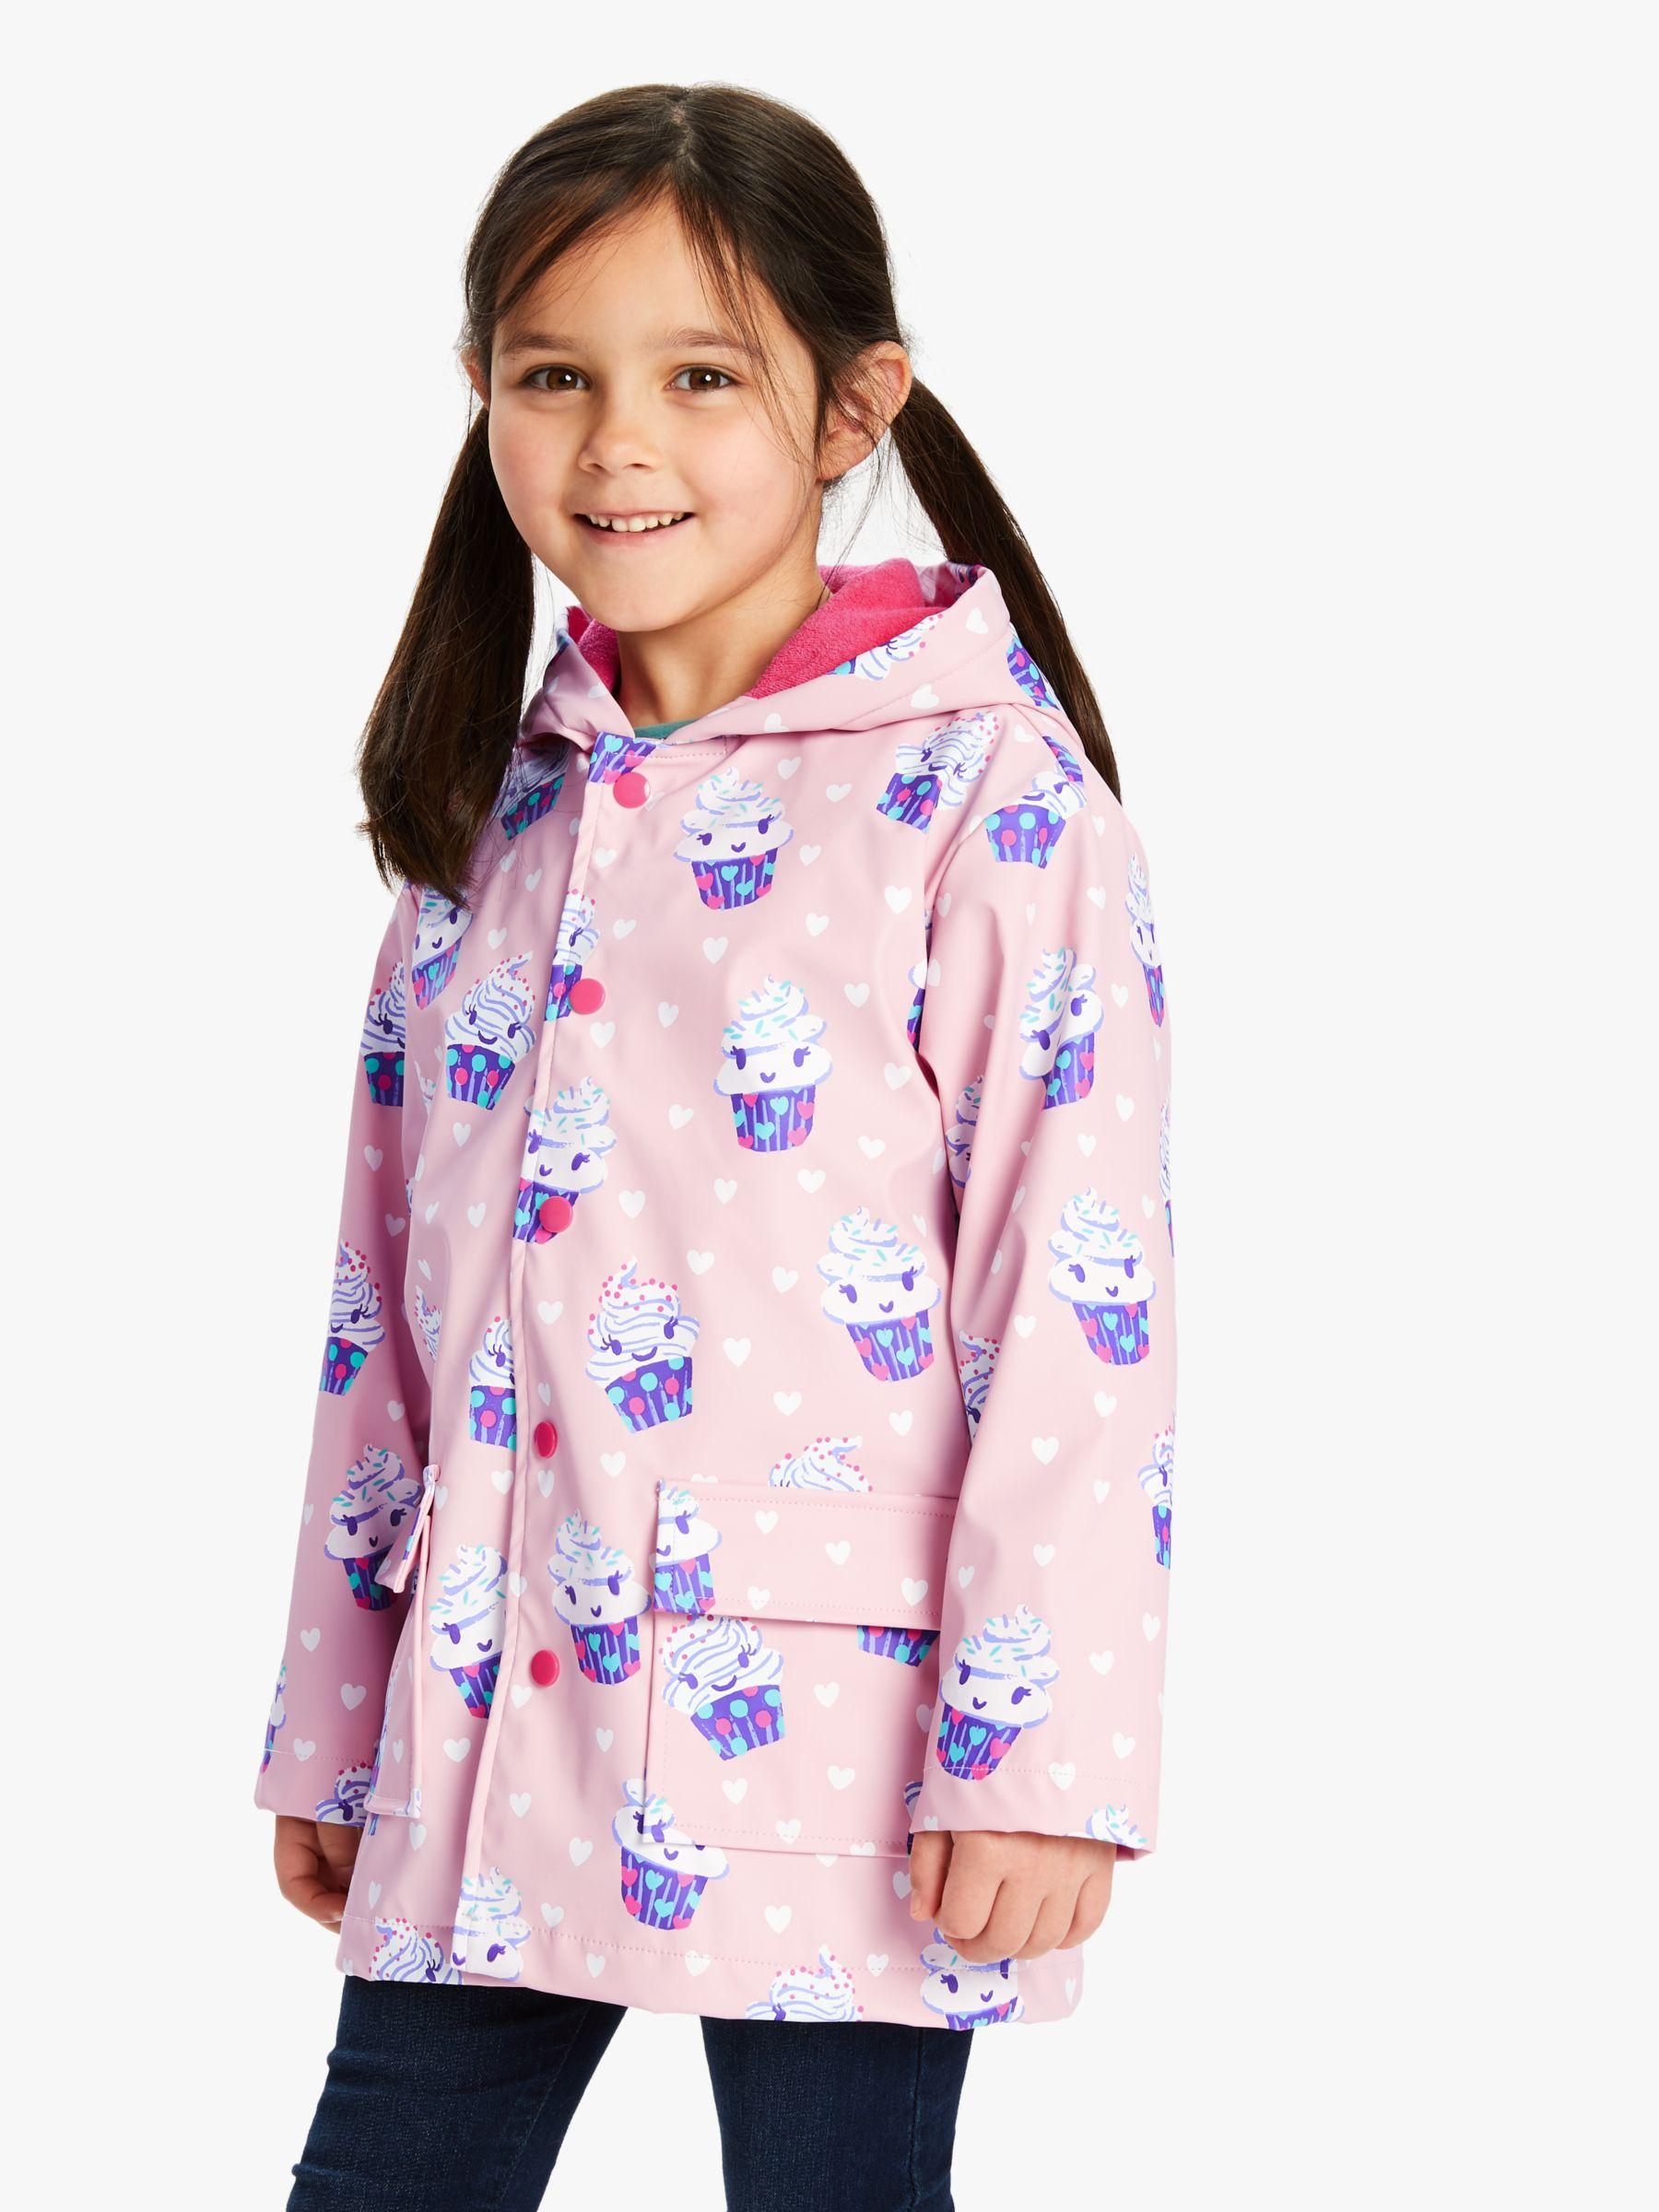 Hatley Hatley Girls' Dancing Cupcakes Raincoat, Pink